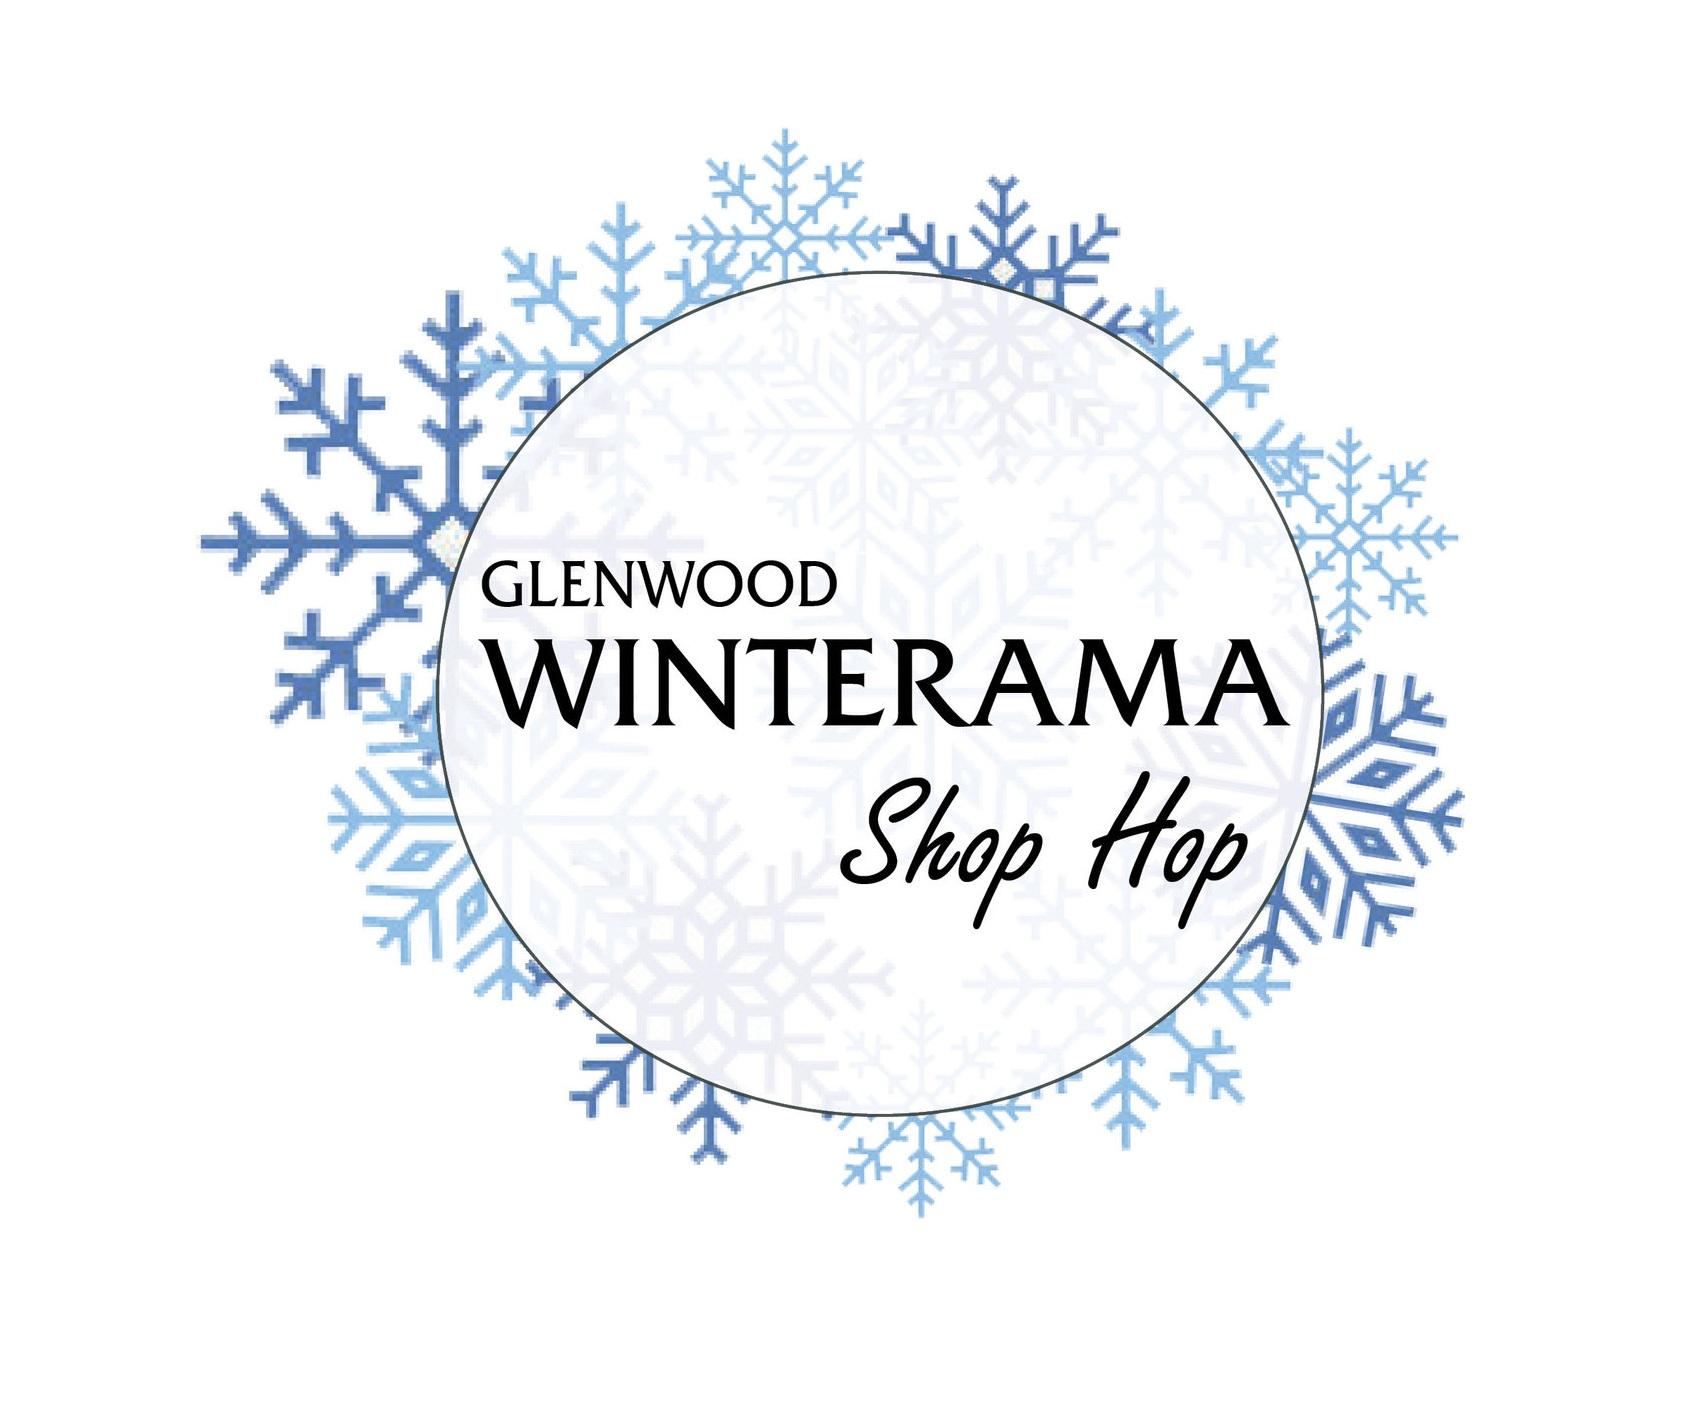 hsh-winterama-banner.jpg